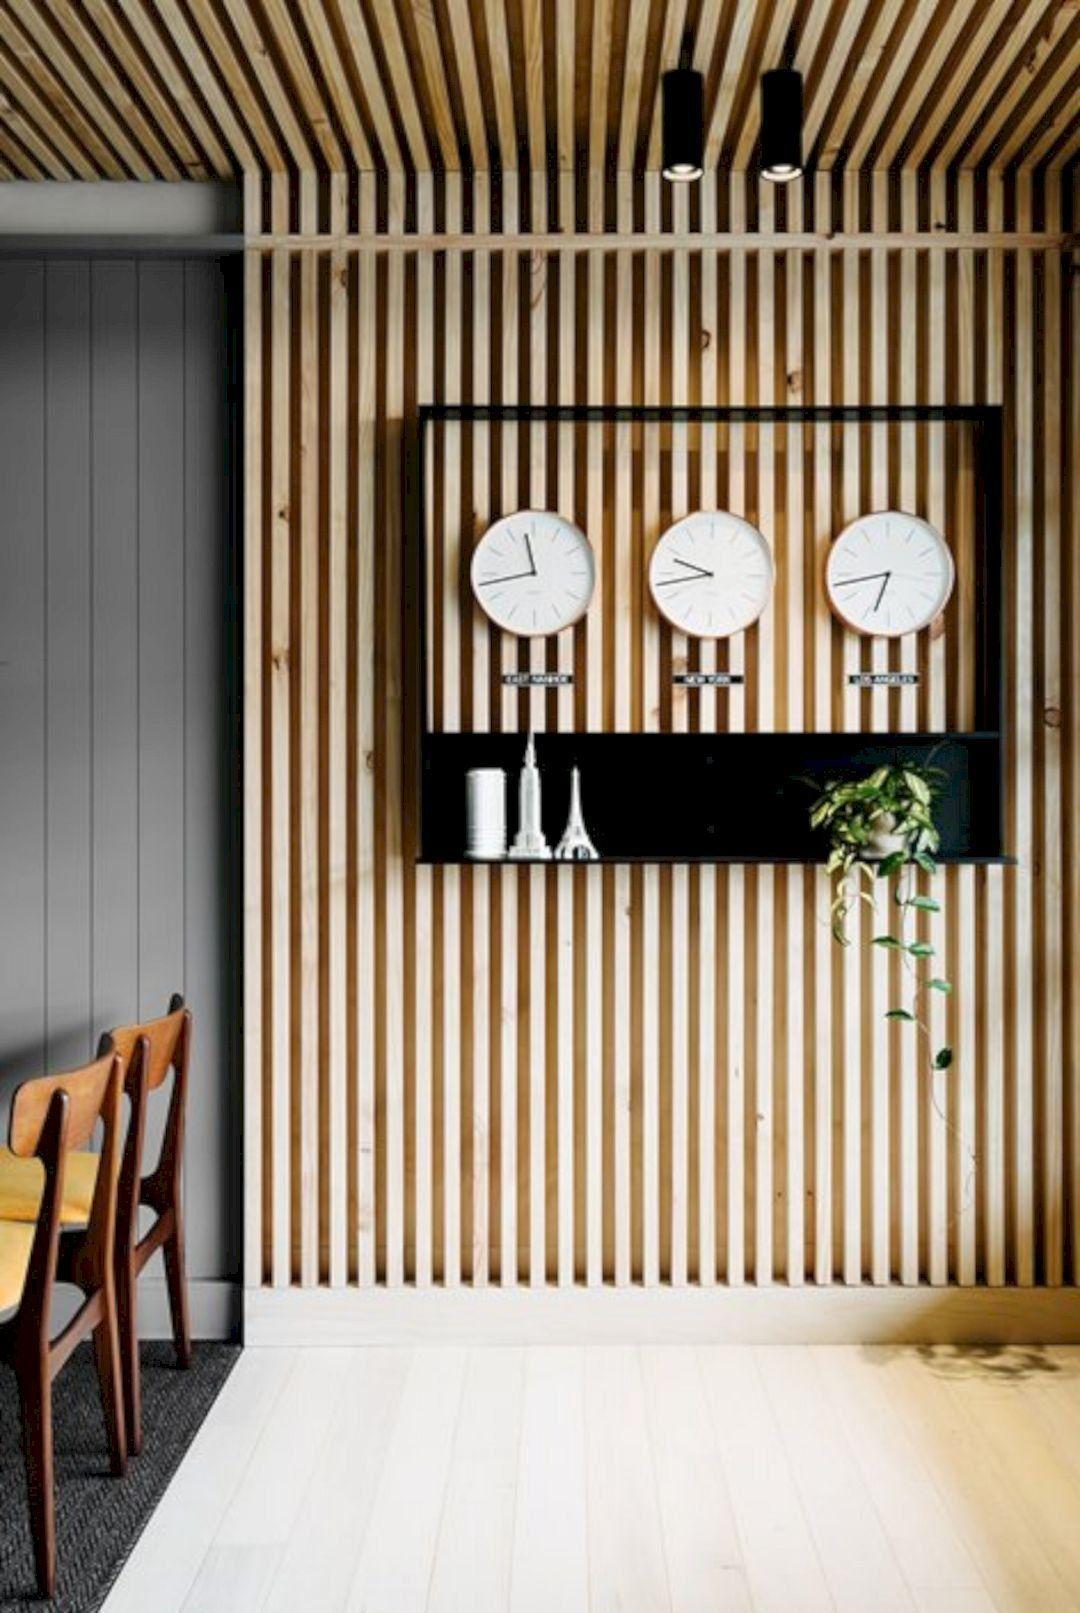 16 Mid-Century Modern Home Decoration Ideas | Wood slat wall, Interior, Interior design